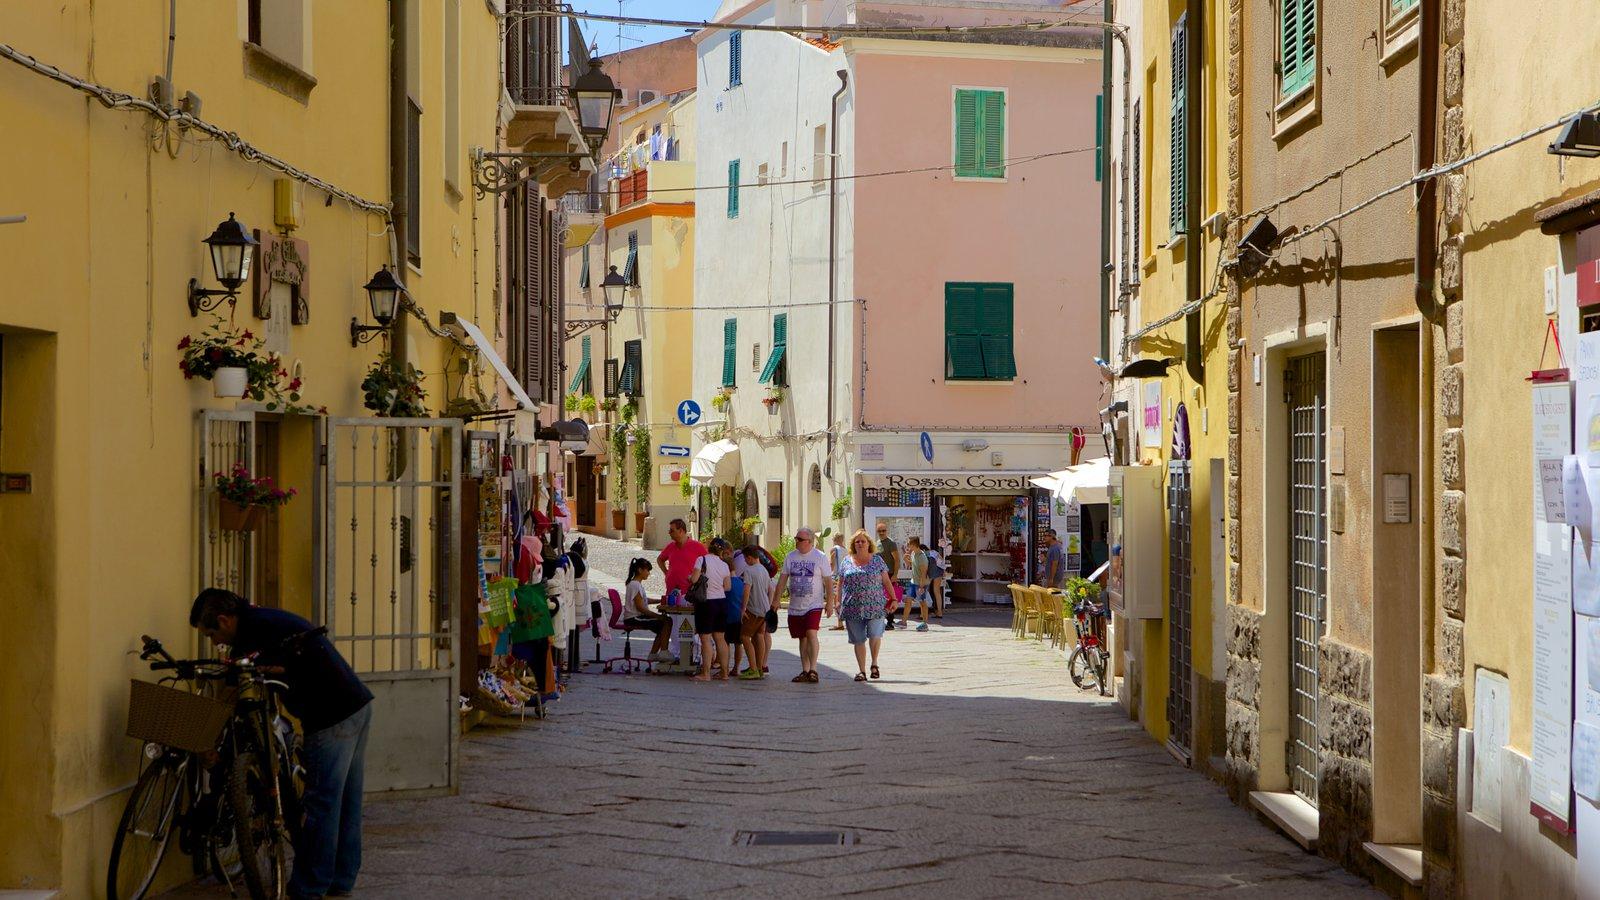 Alghero - Northern Sardinia showing street scenes